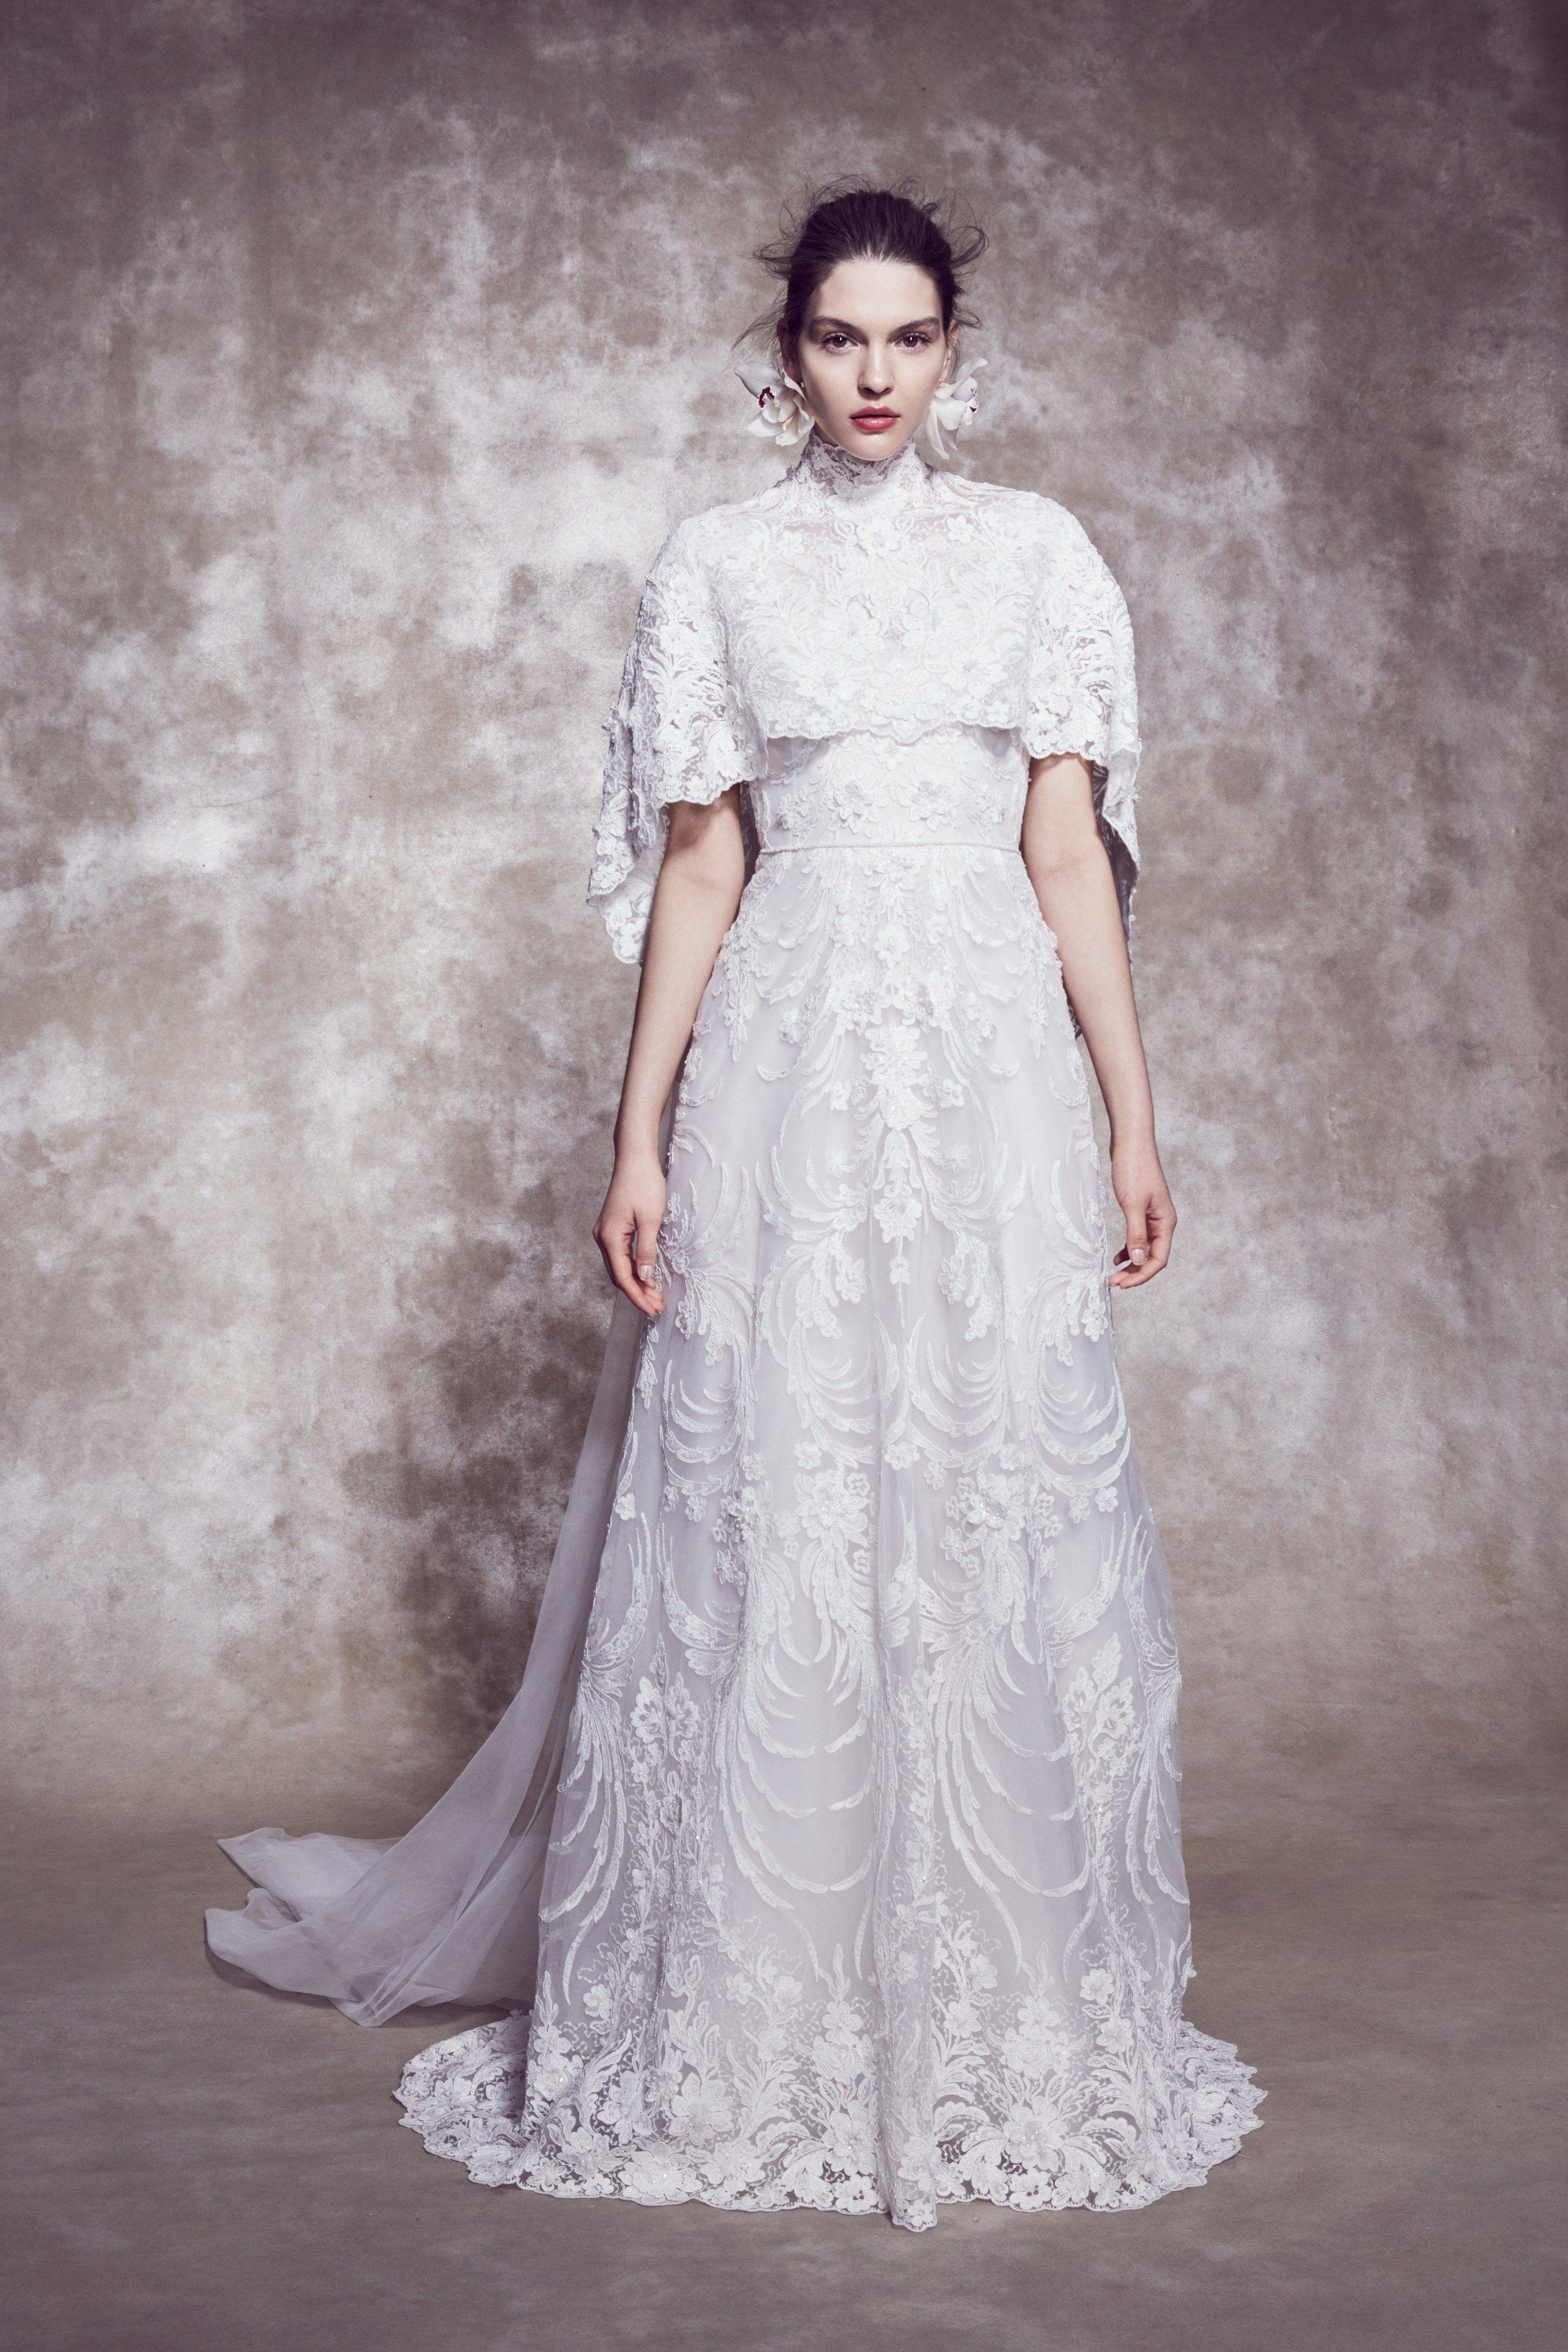 best winter wedding dresses & trends for 2020 - winter